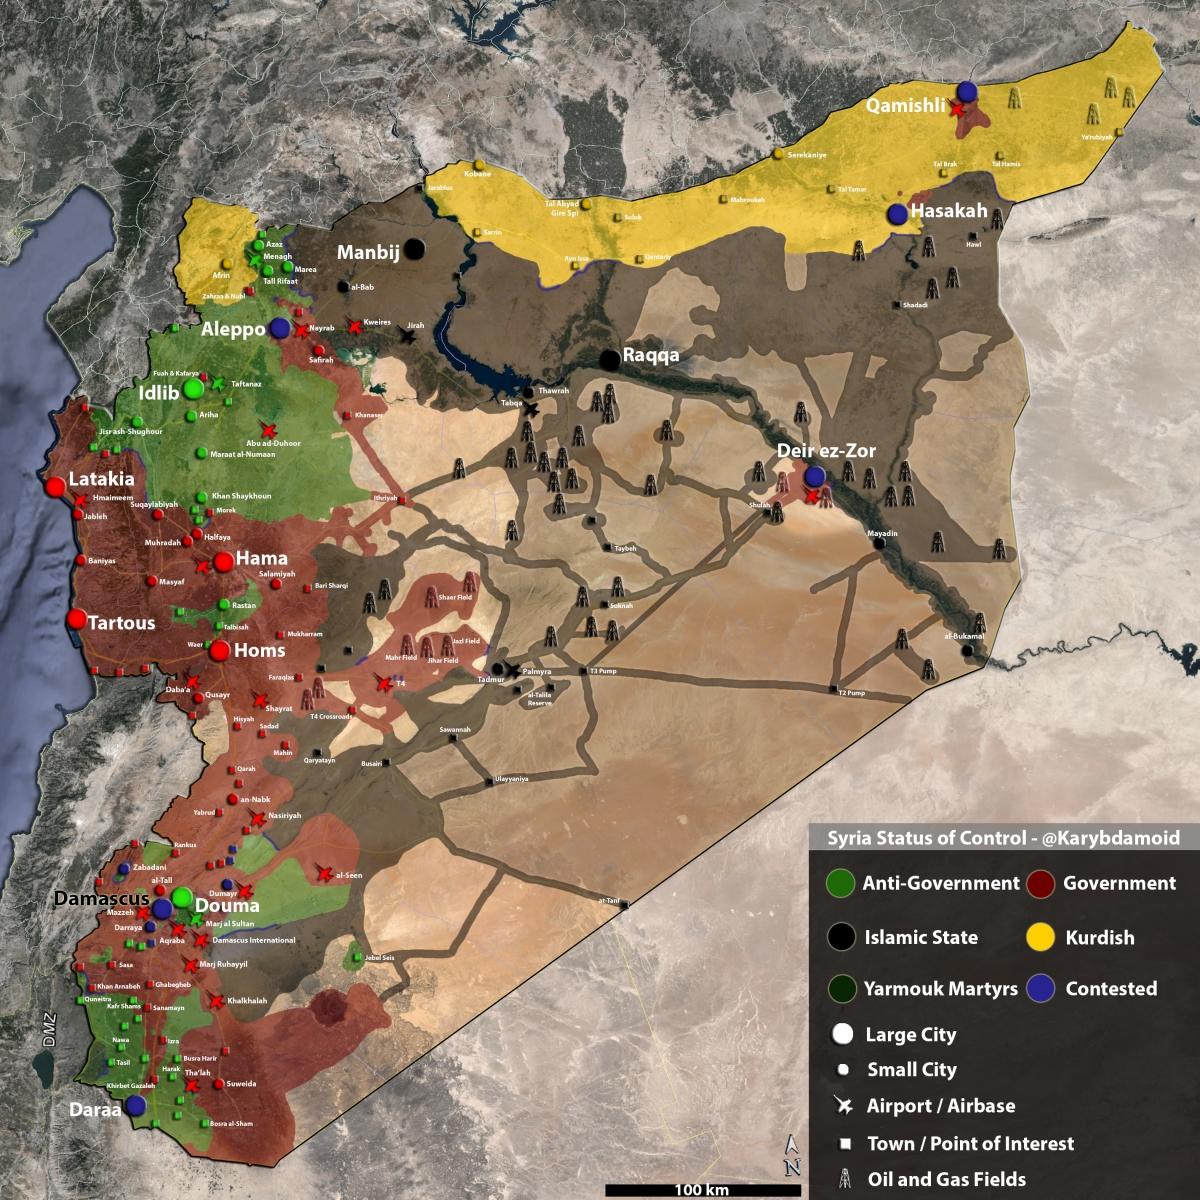 Syria oil wells